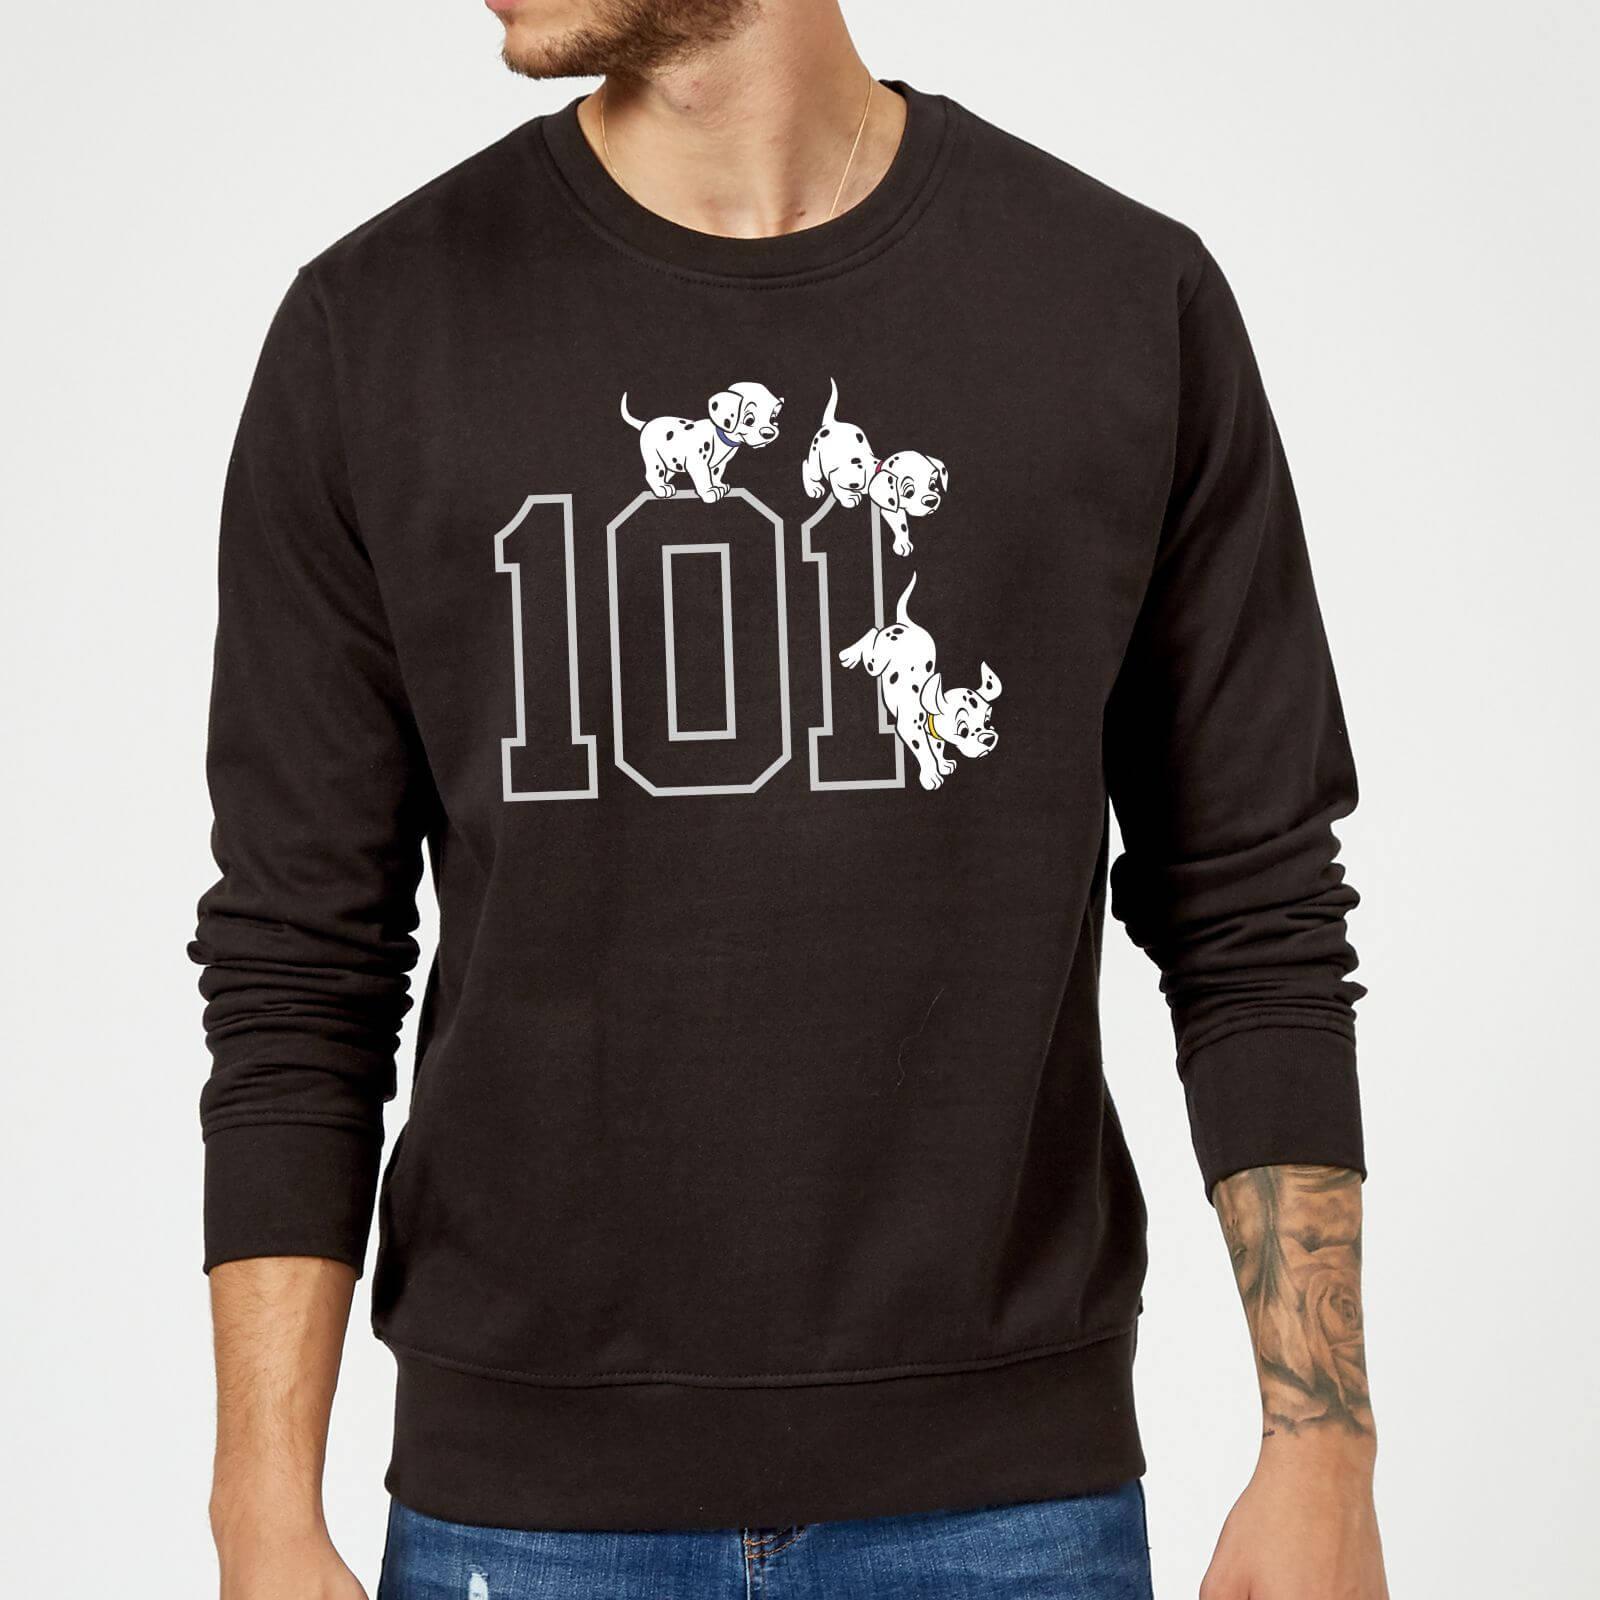 Disney Disney 101 Dalmatians 101 Doggies Sweatshirt - Black - 5XL - Black